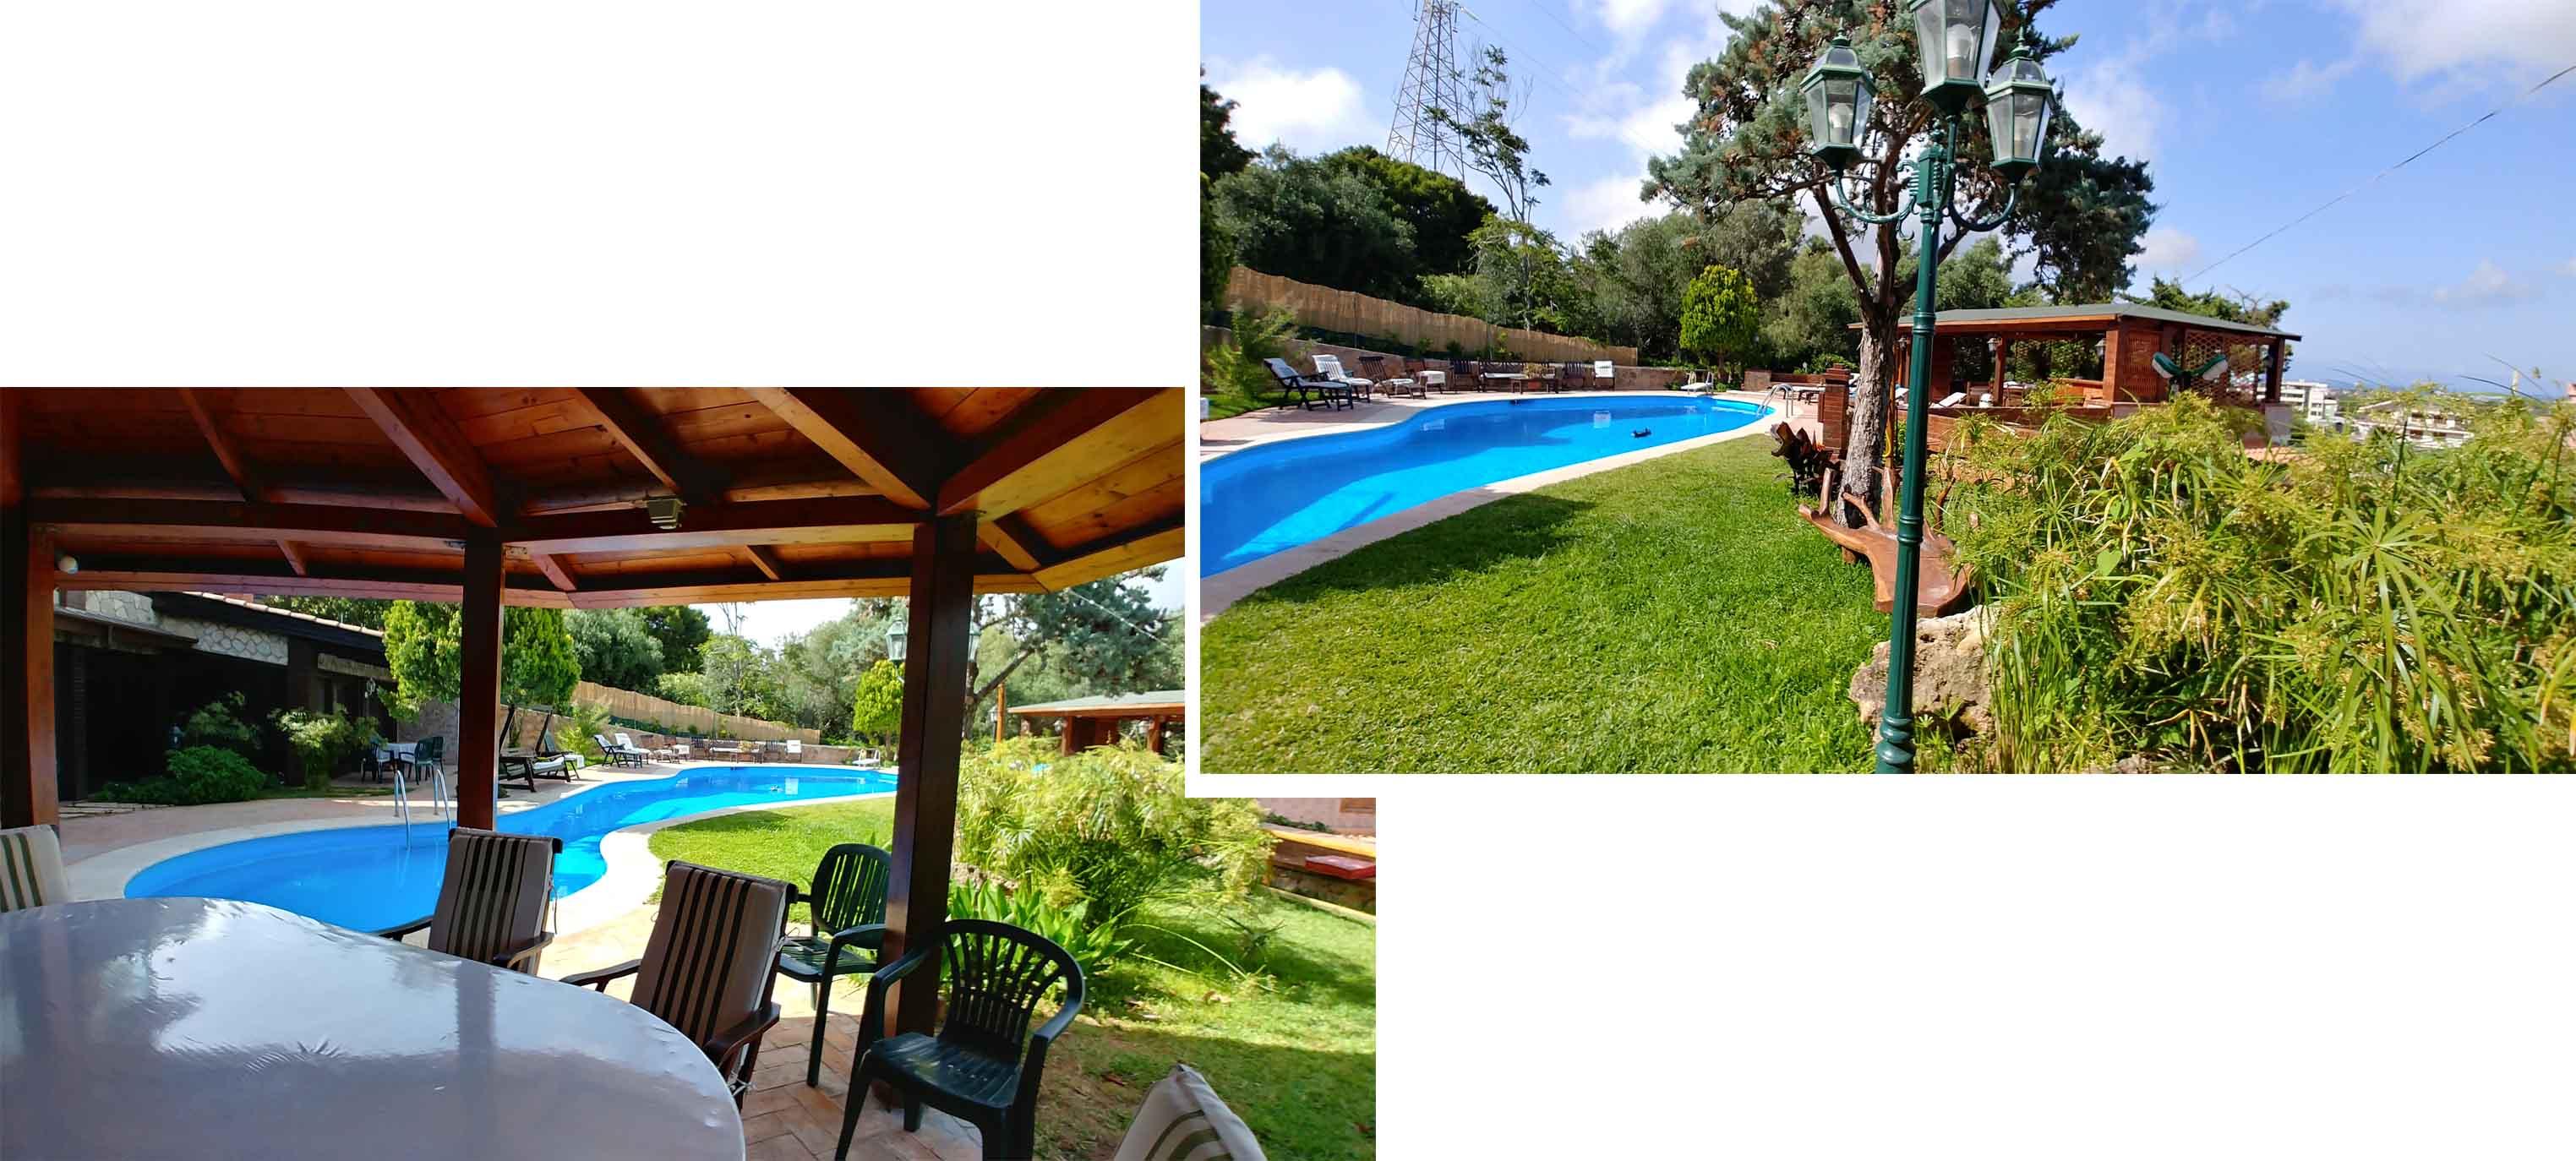 Pool, gazebo and the mainbuilding inthe background